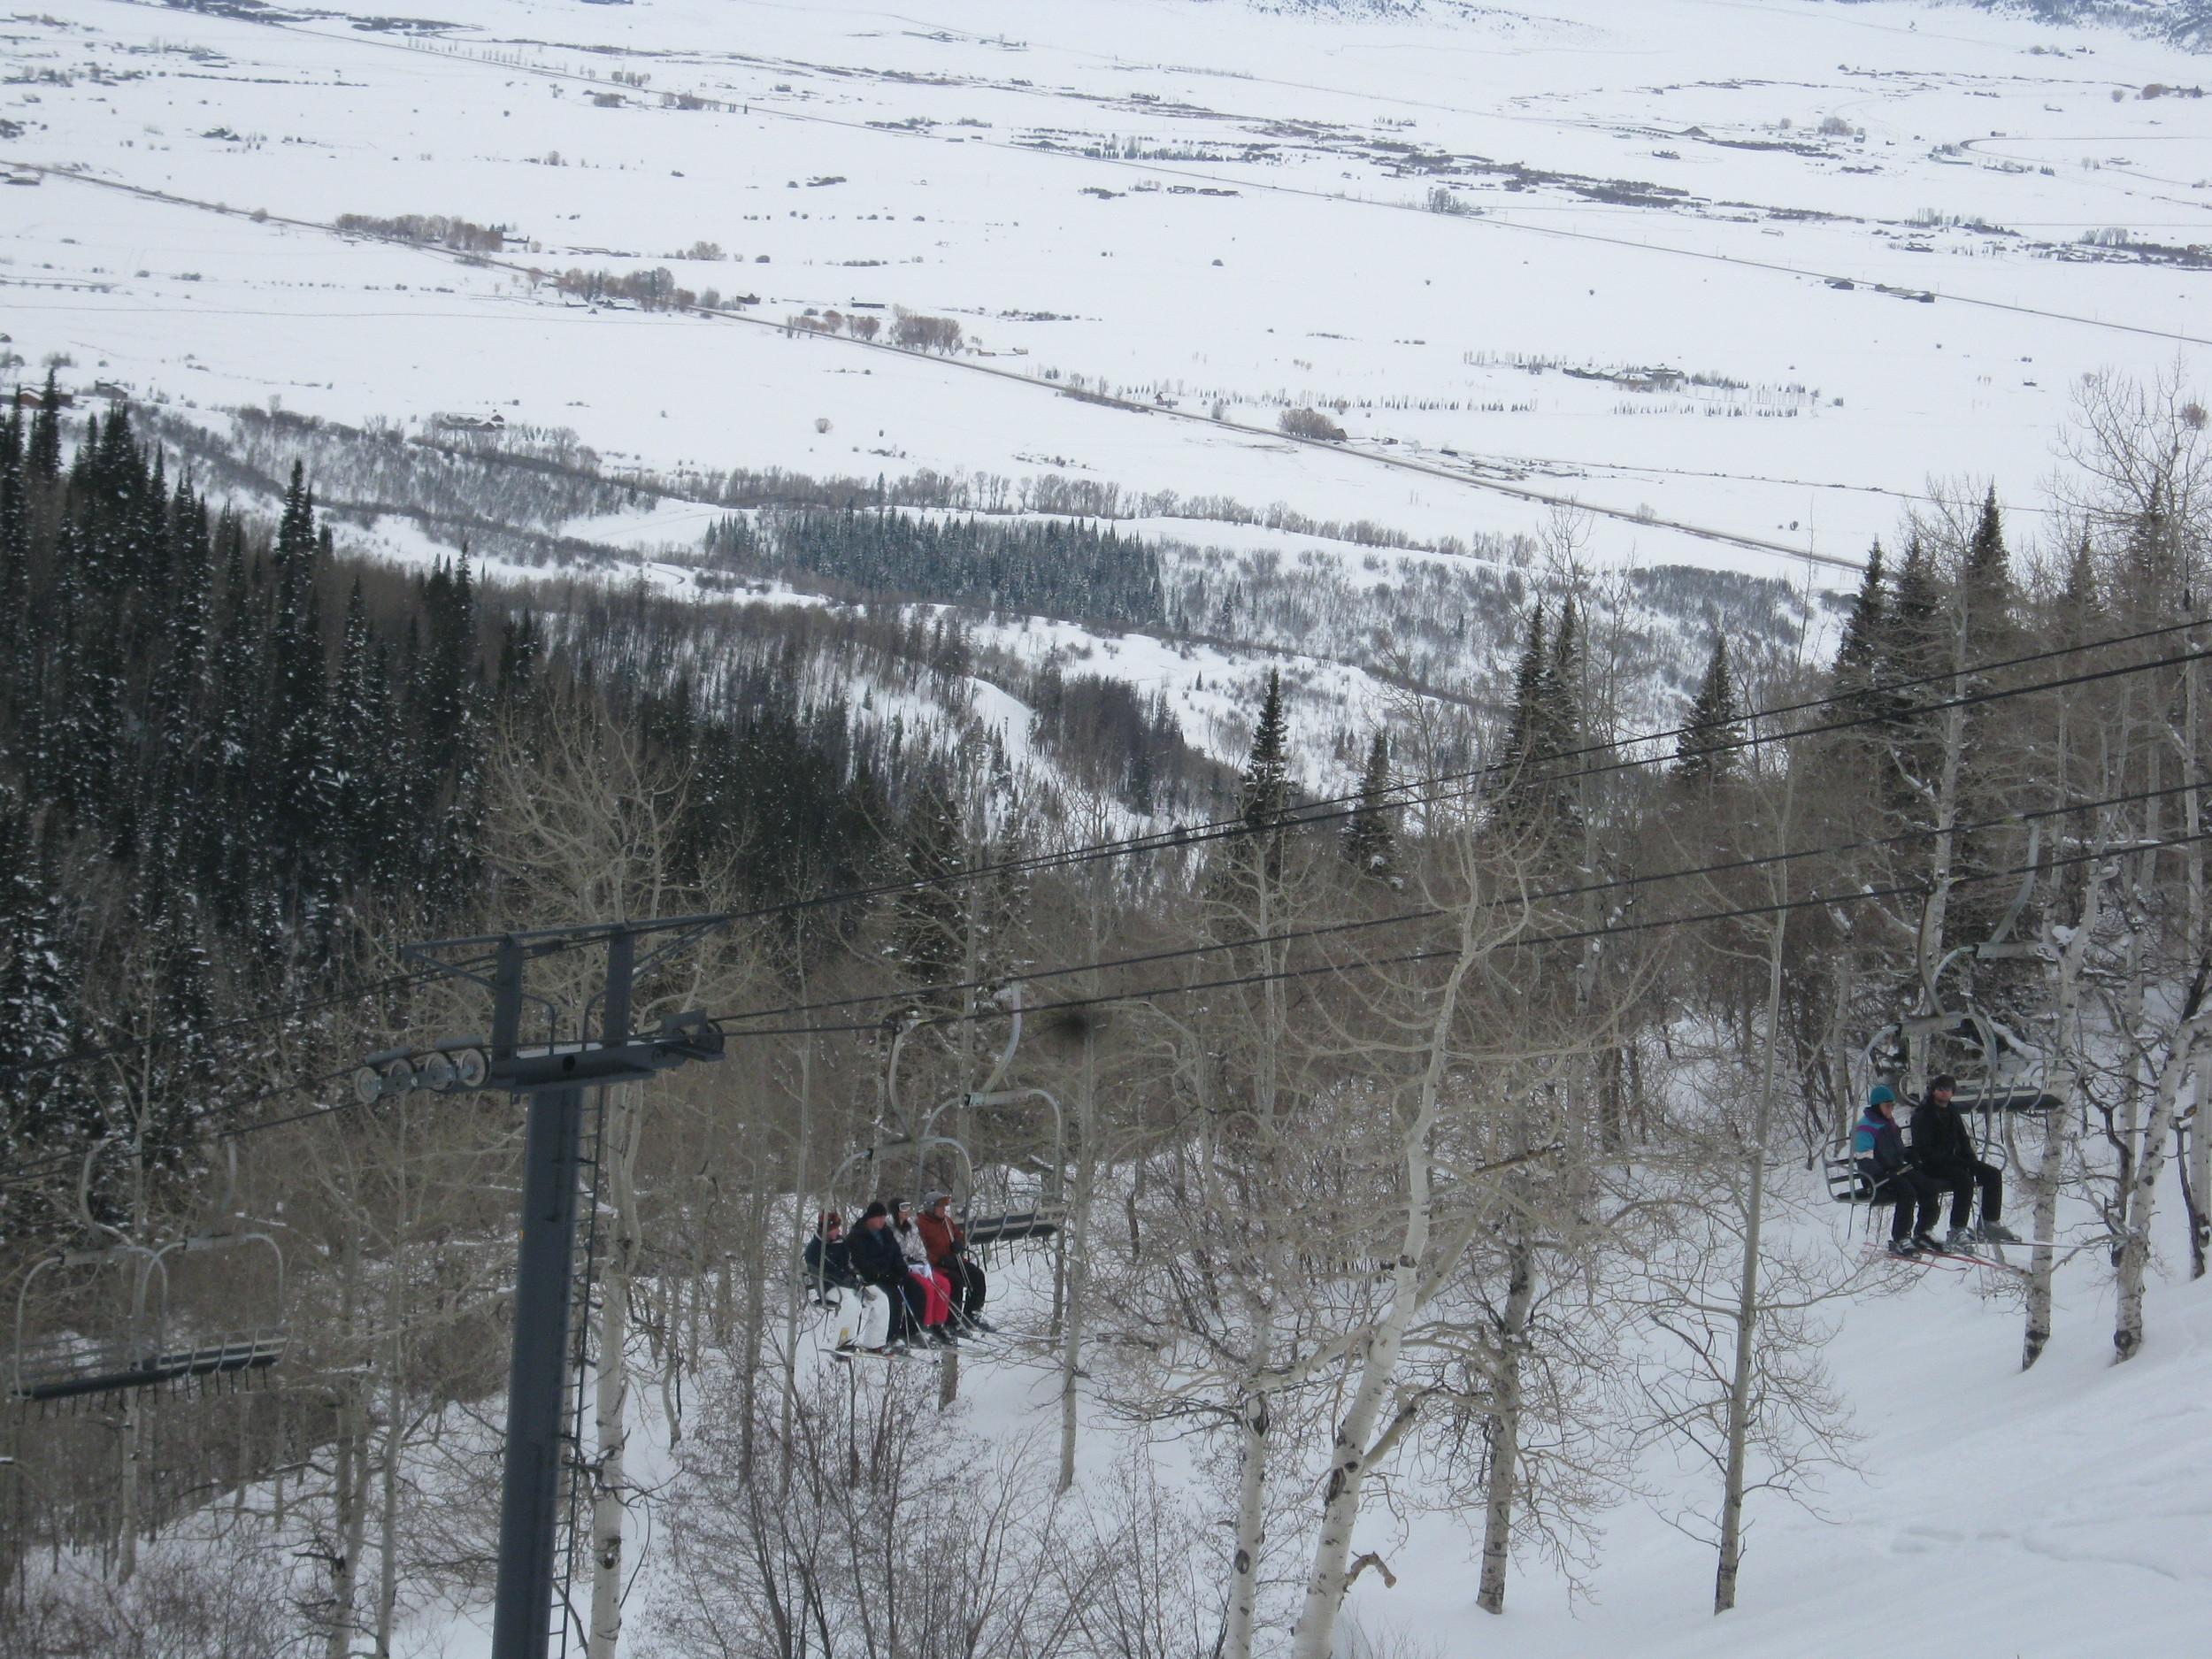 The ski lift of death.